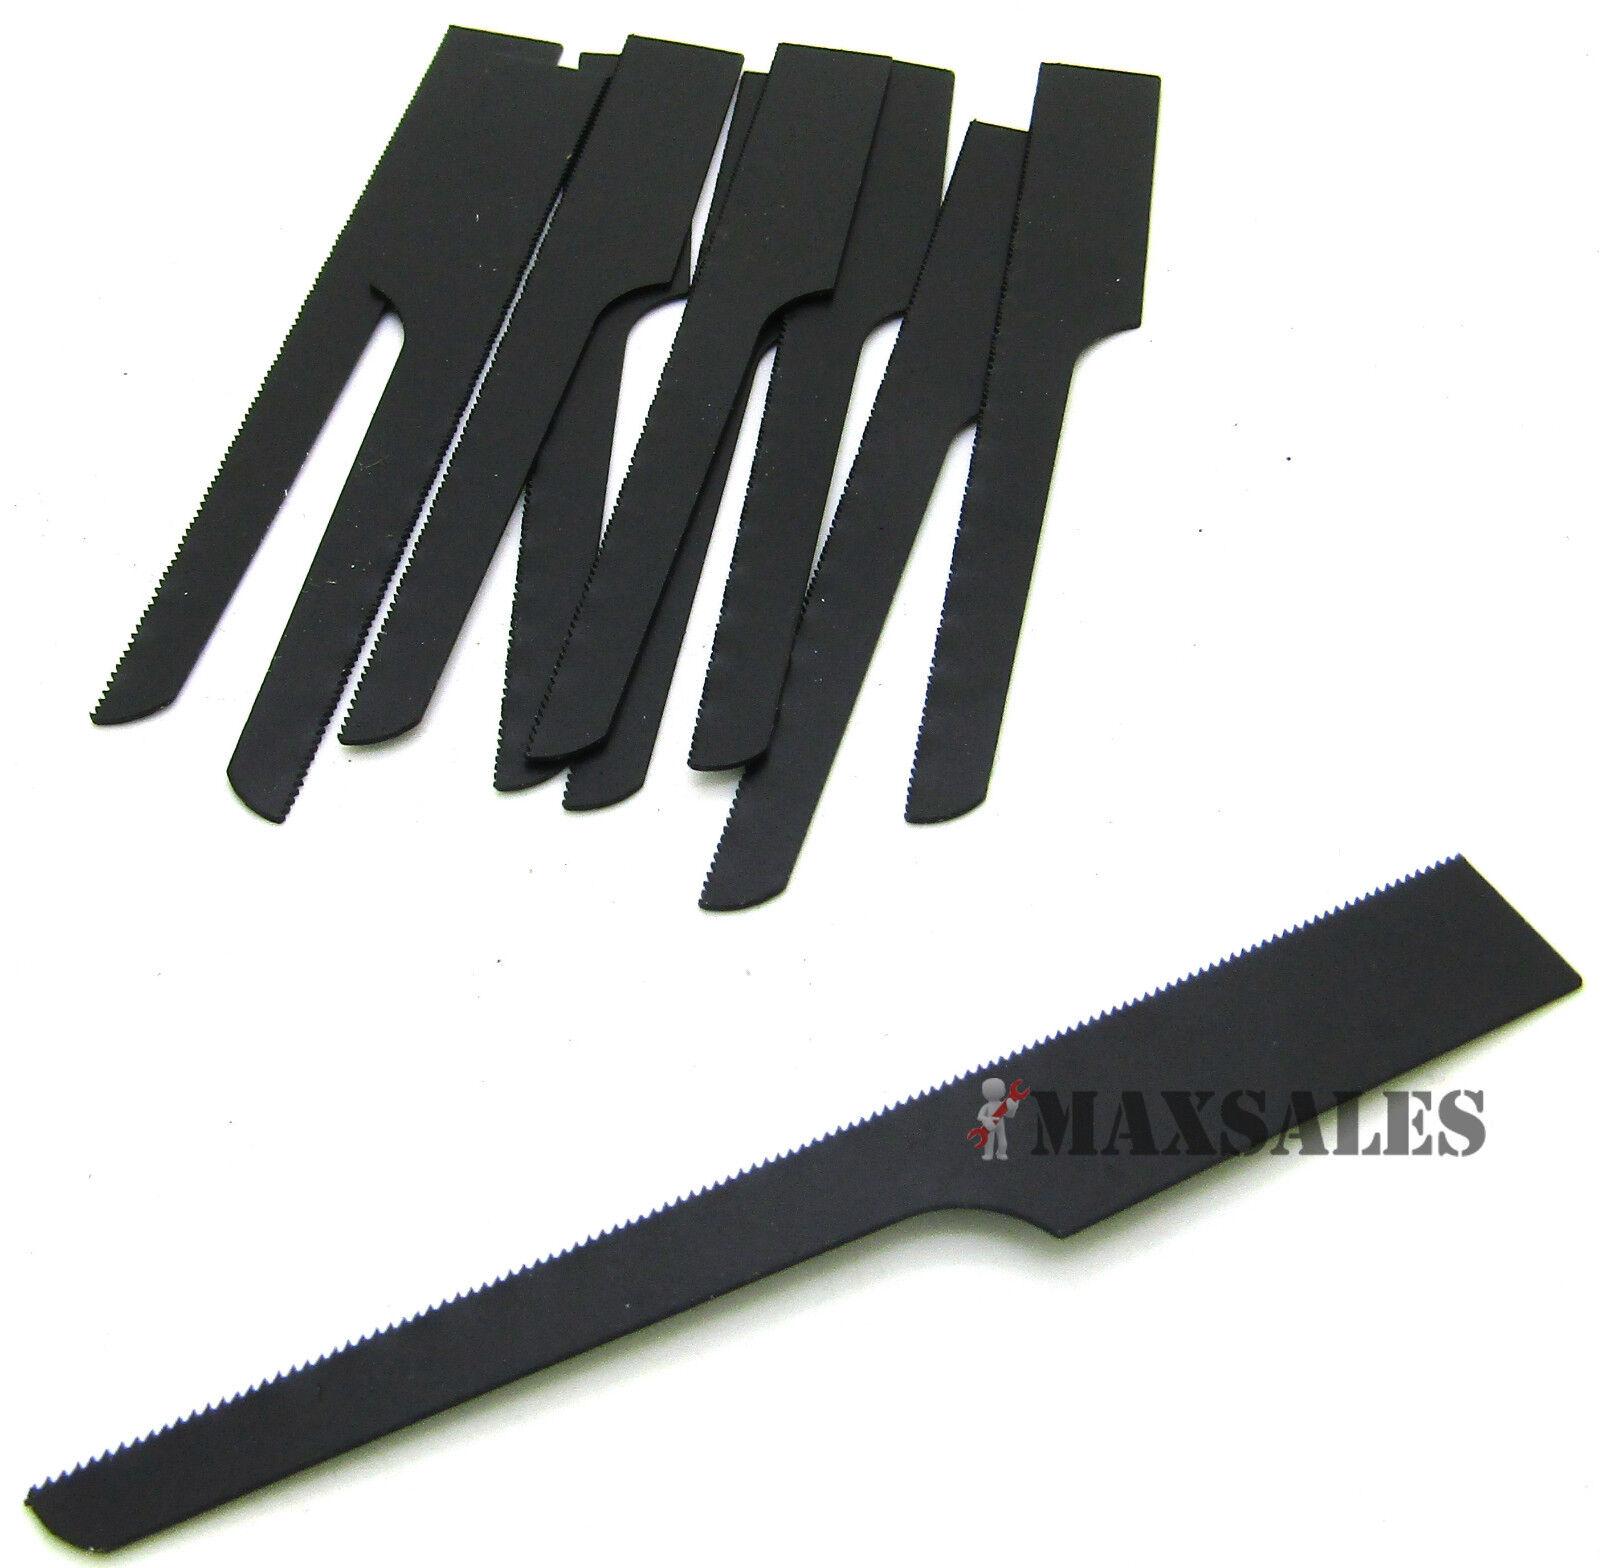 10pc AIR BODY SAW BLADES 32TPI BI-METAL black reciprocating